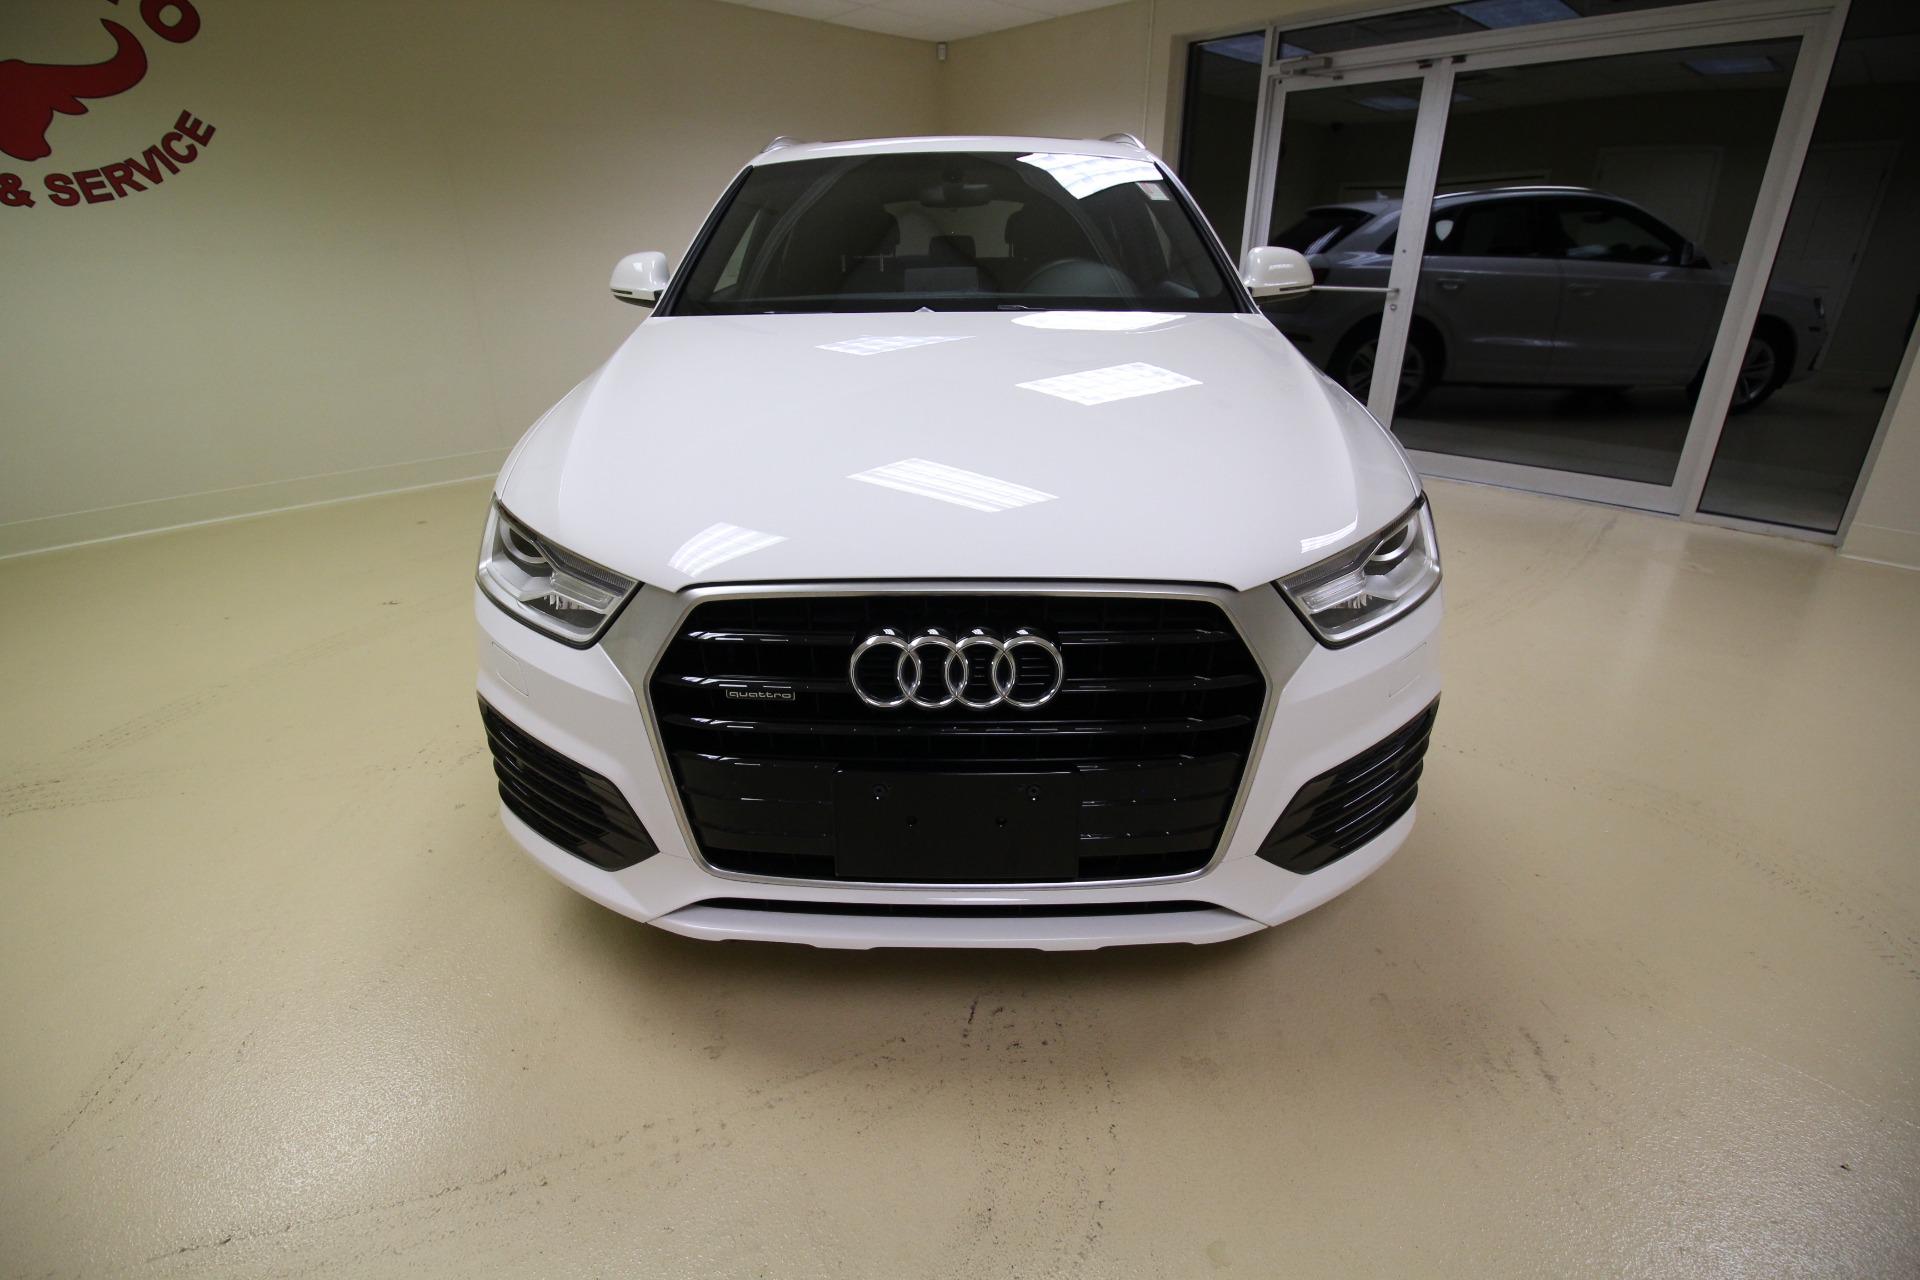 Cars For Sale Albany Ny >> 2018 Audi Q3 Premium quattro Stock # 18204 for sale near Albany, NY | NY Audi Dealer For Sale in ...